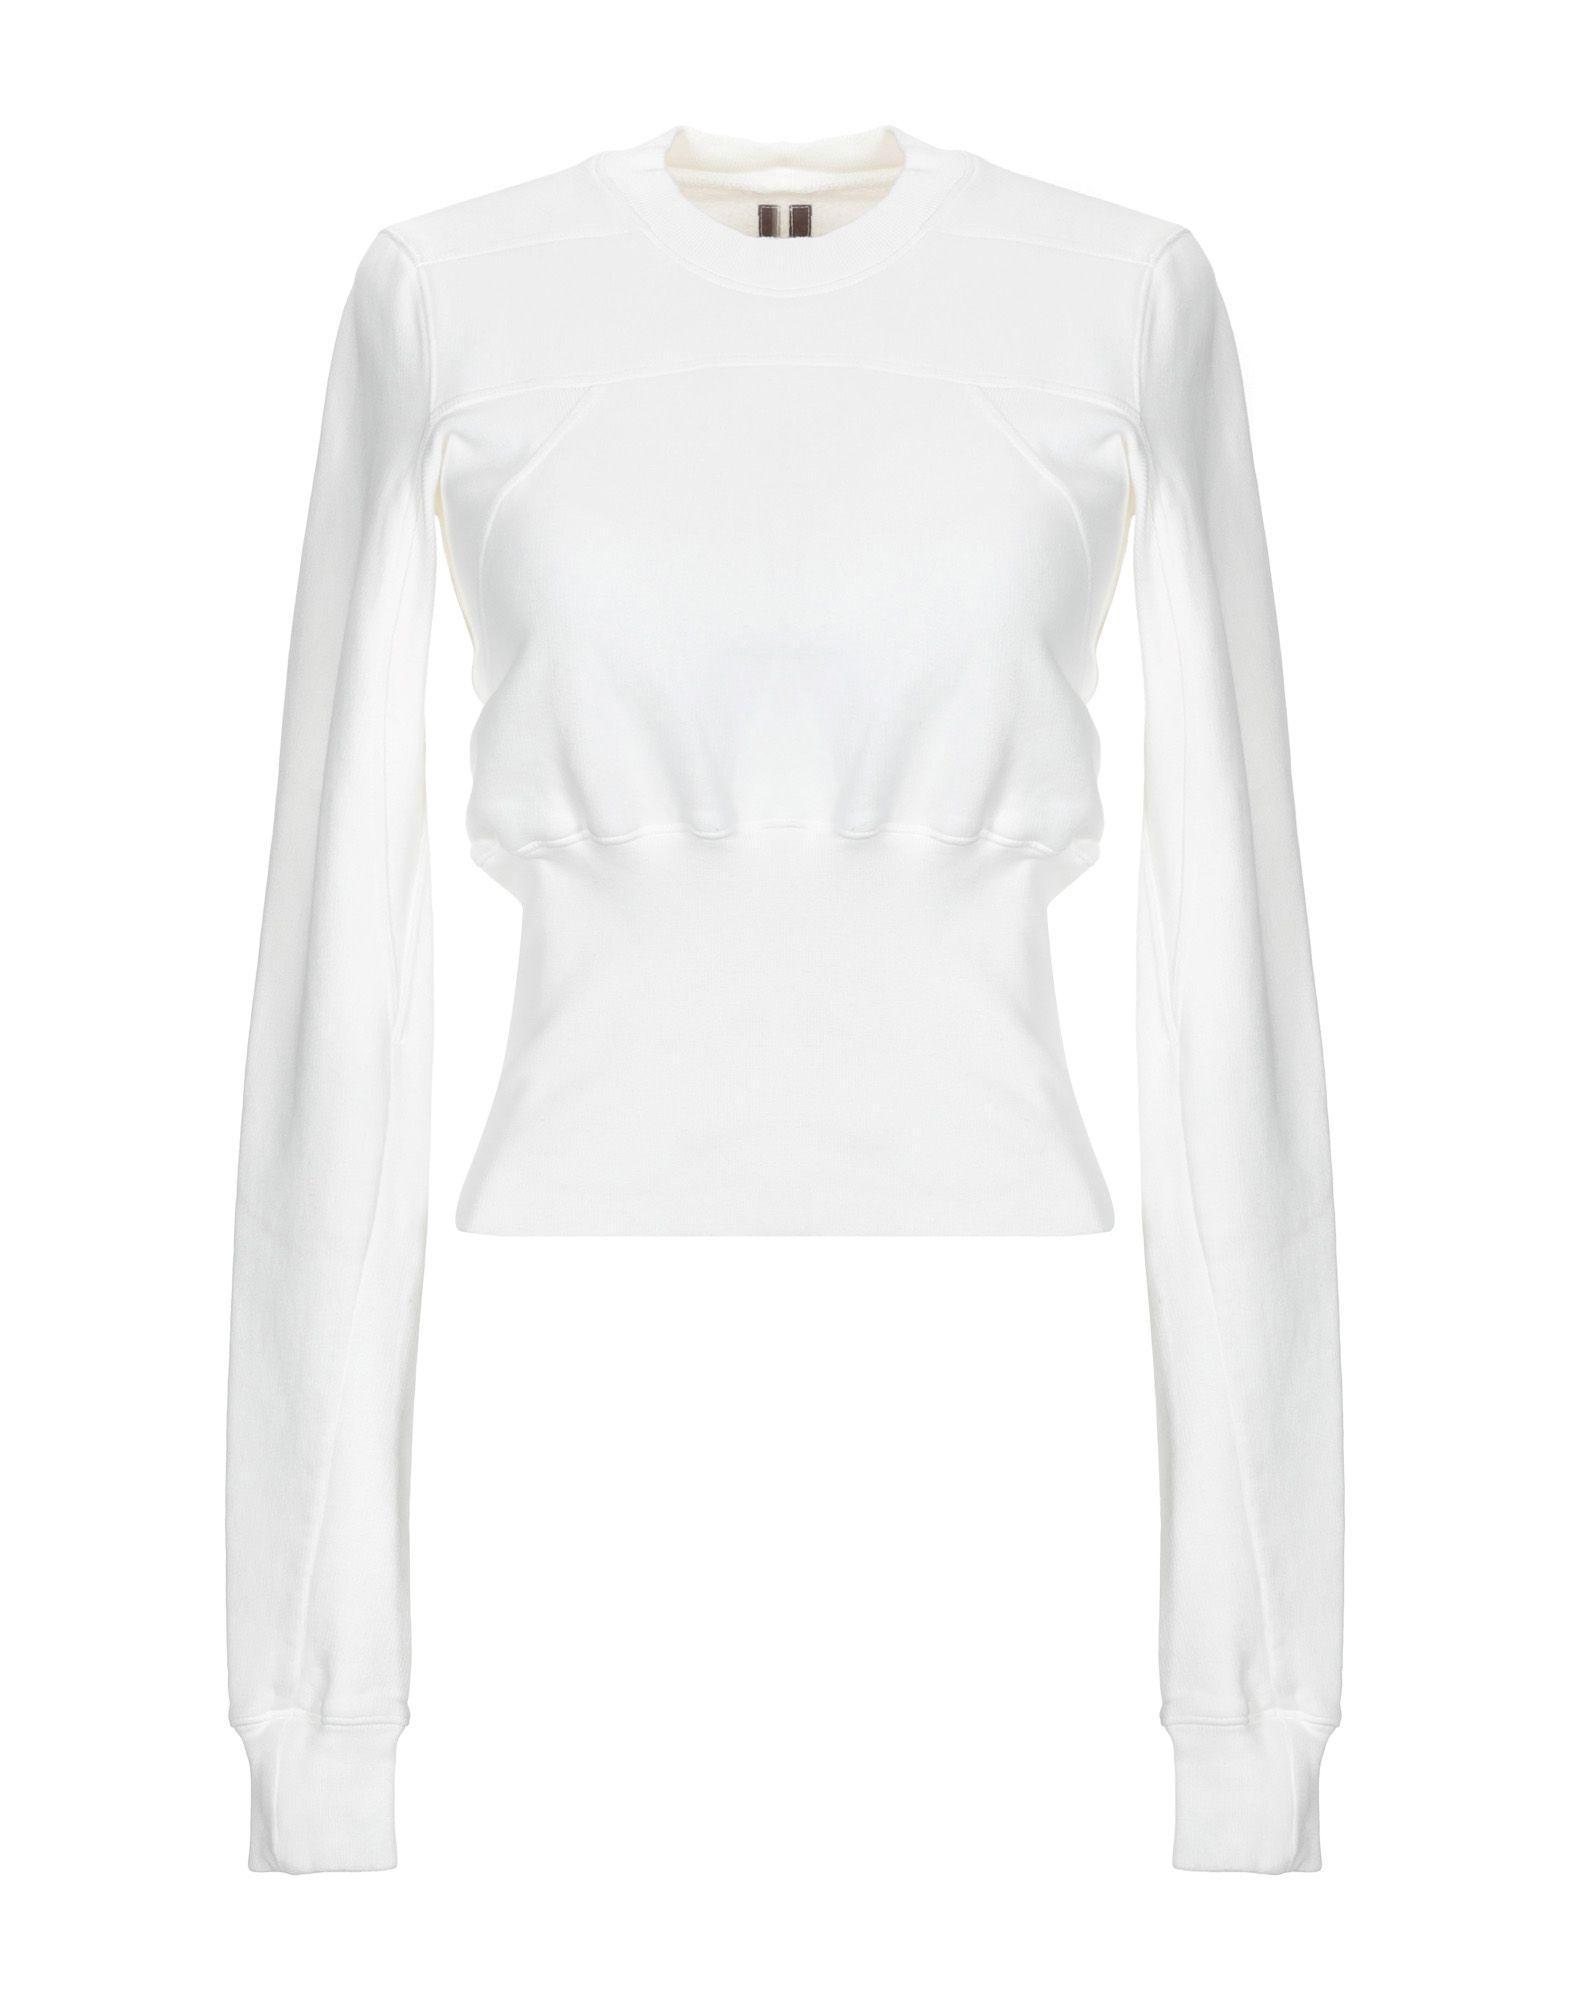 6690a57e40587 Lyst - Drkshdw By Rick Owens Sweatshirt in White